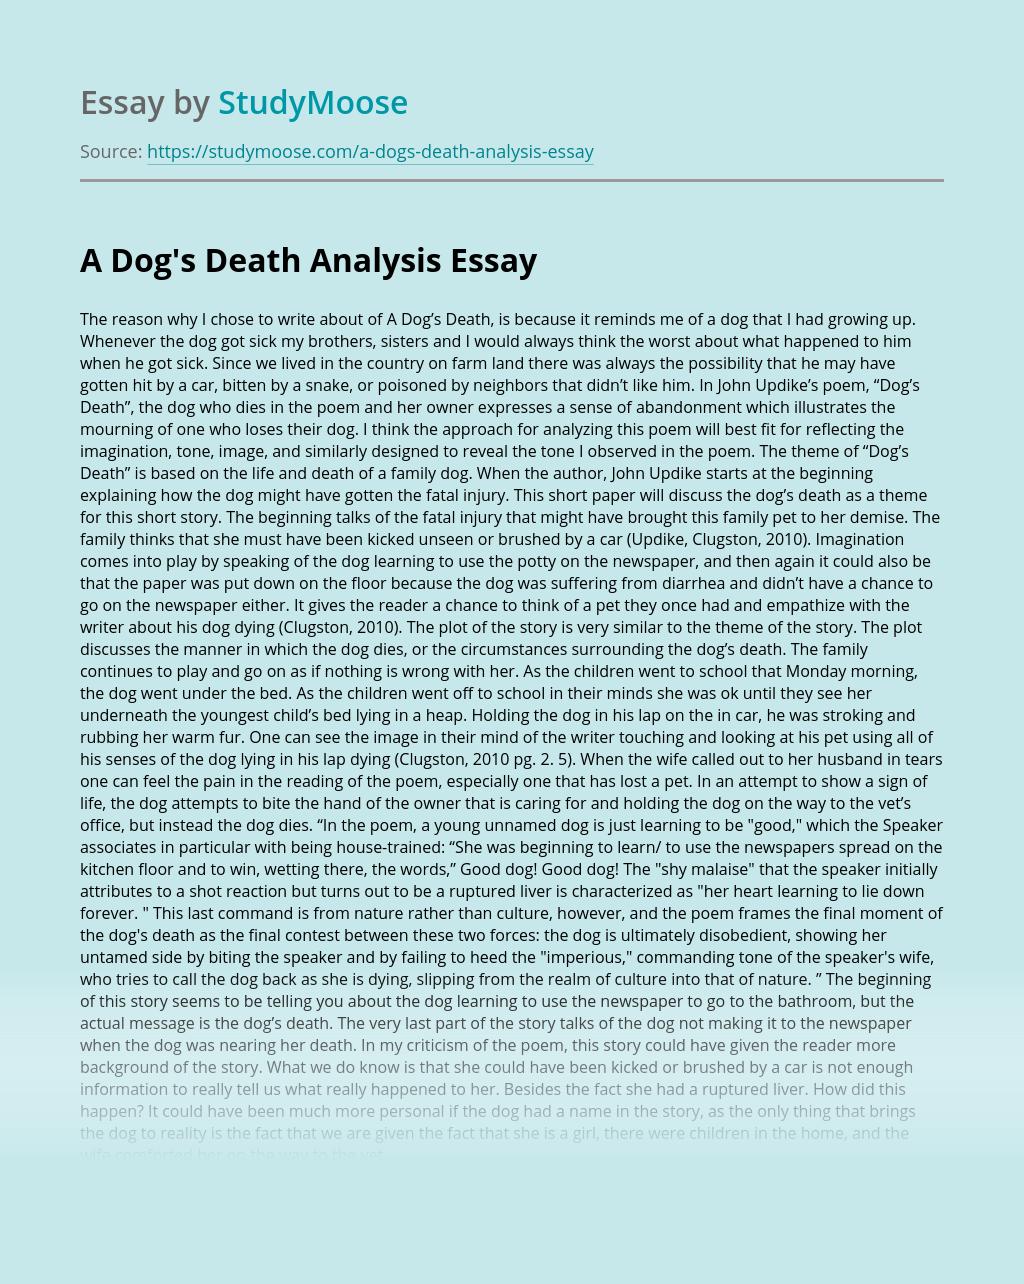 A Dog's Death Analysis